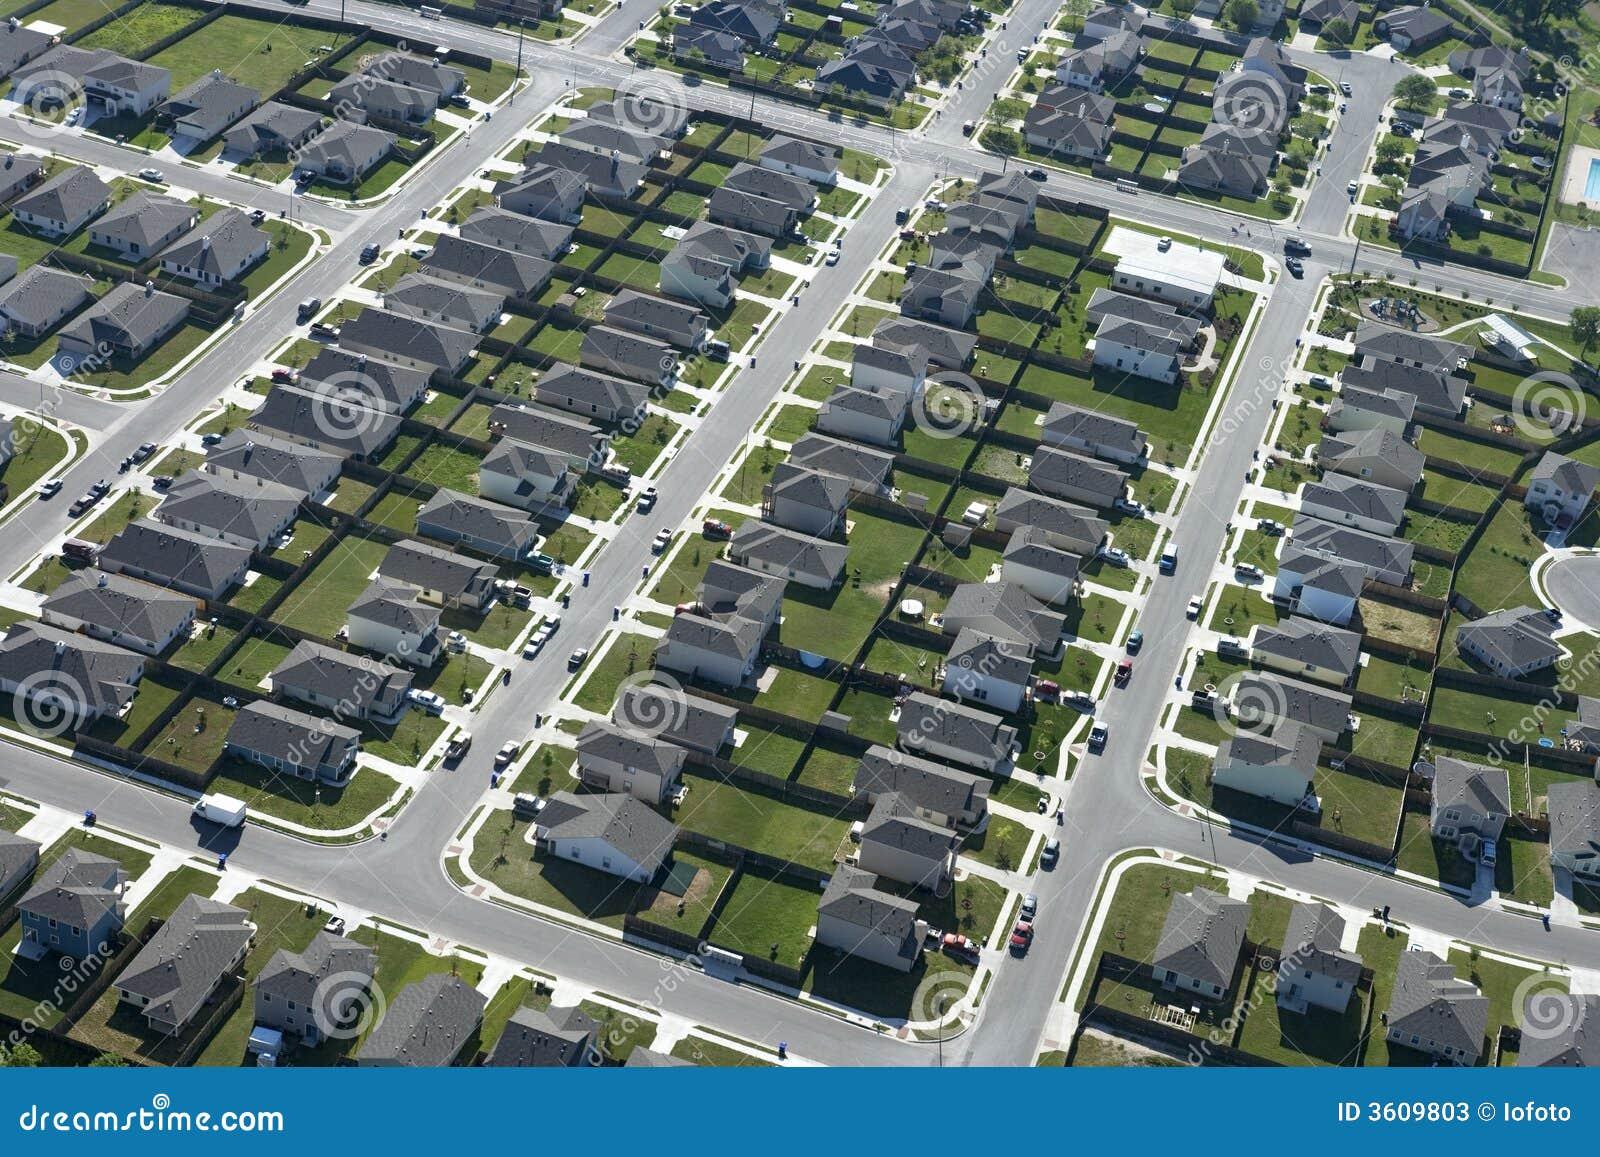 Texas Suburb Stock Photos Image 3609803